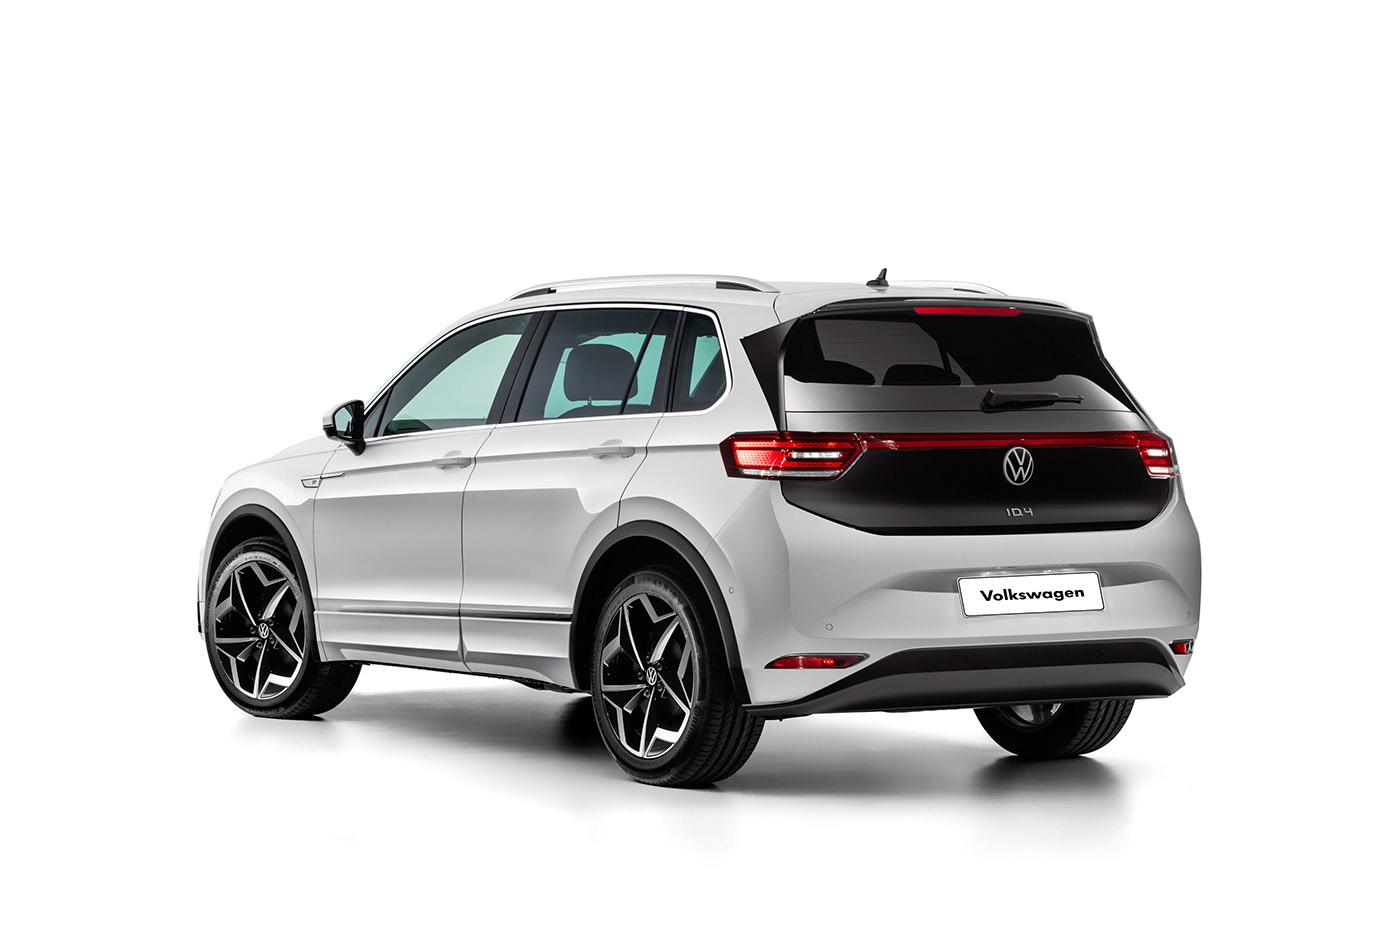 2019 Volkswagen Tiguan 132TSI R-Line Edition